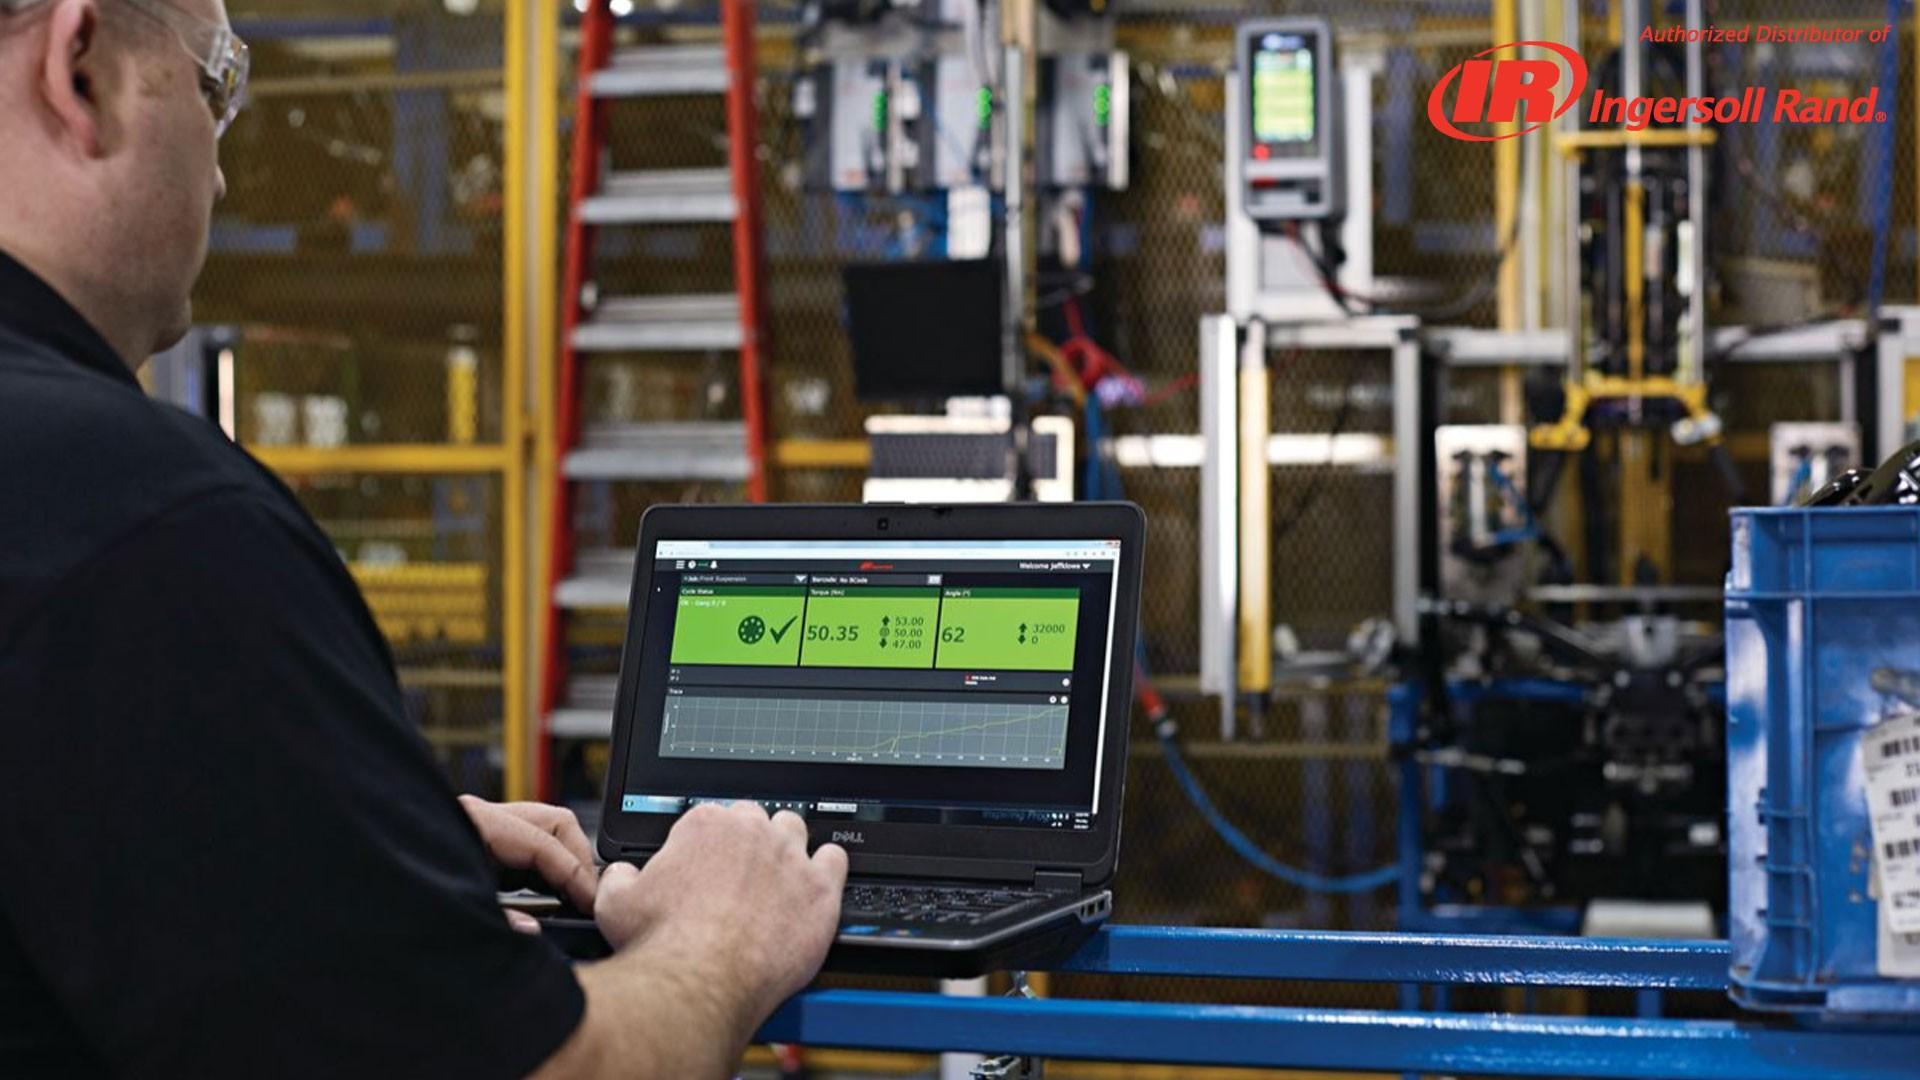 Ingersoll Rand INSIGHTqc echipamente asamblare productie ircat